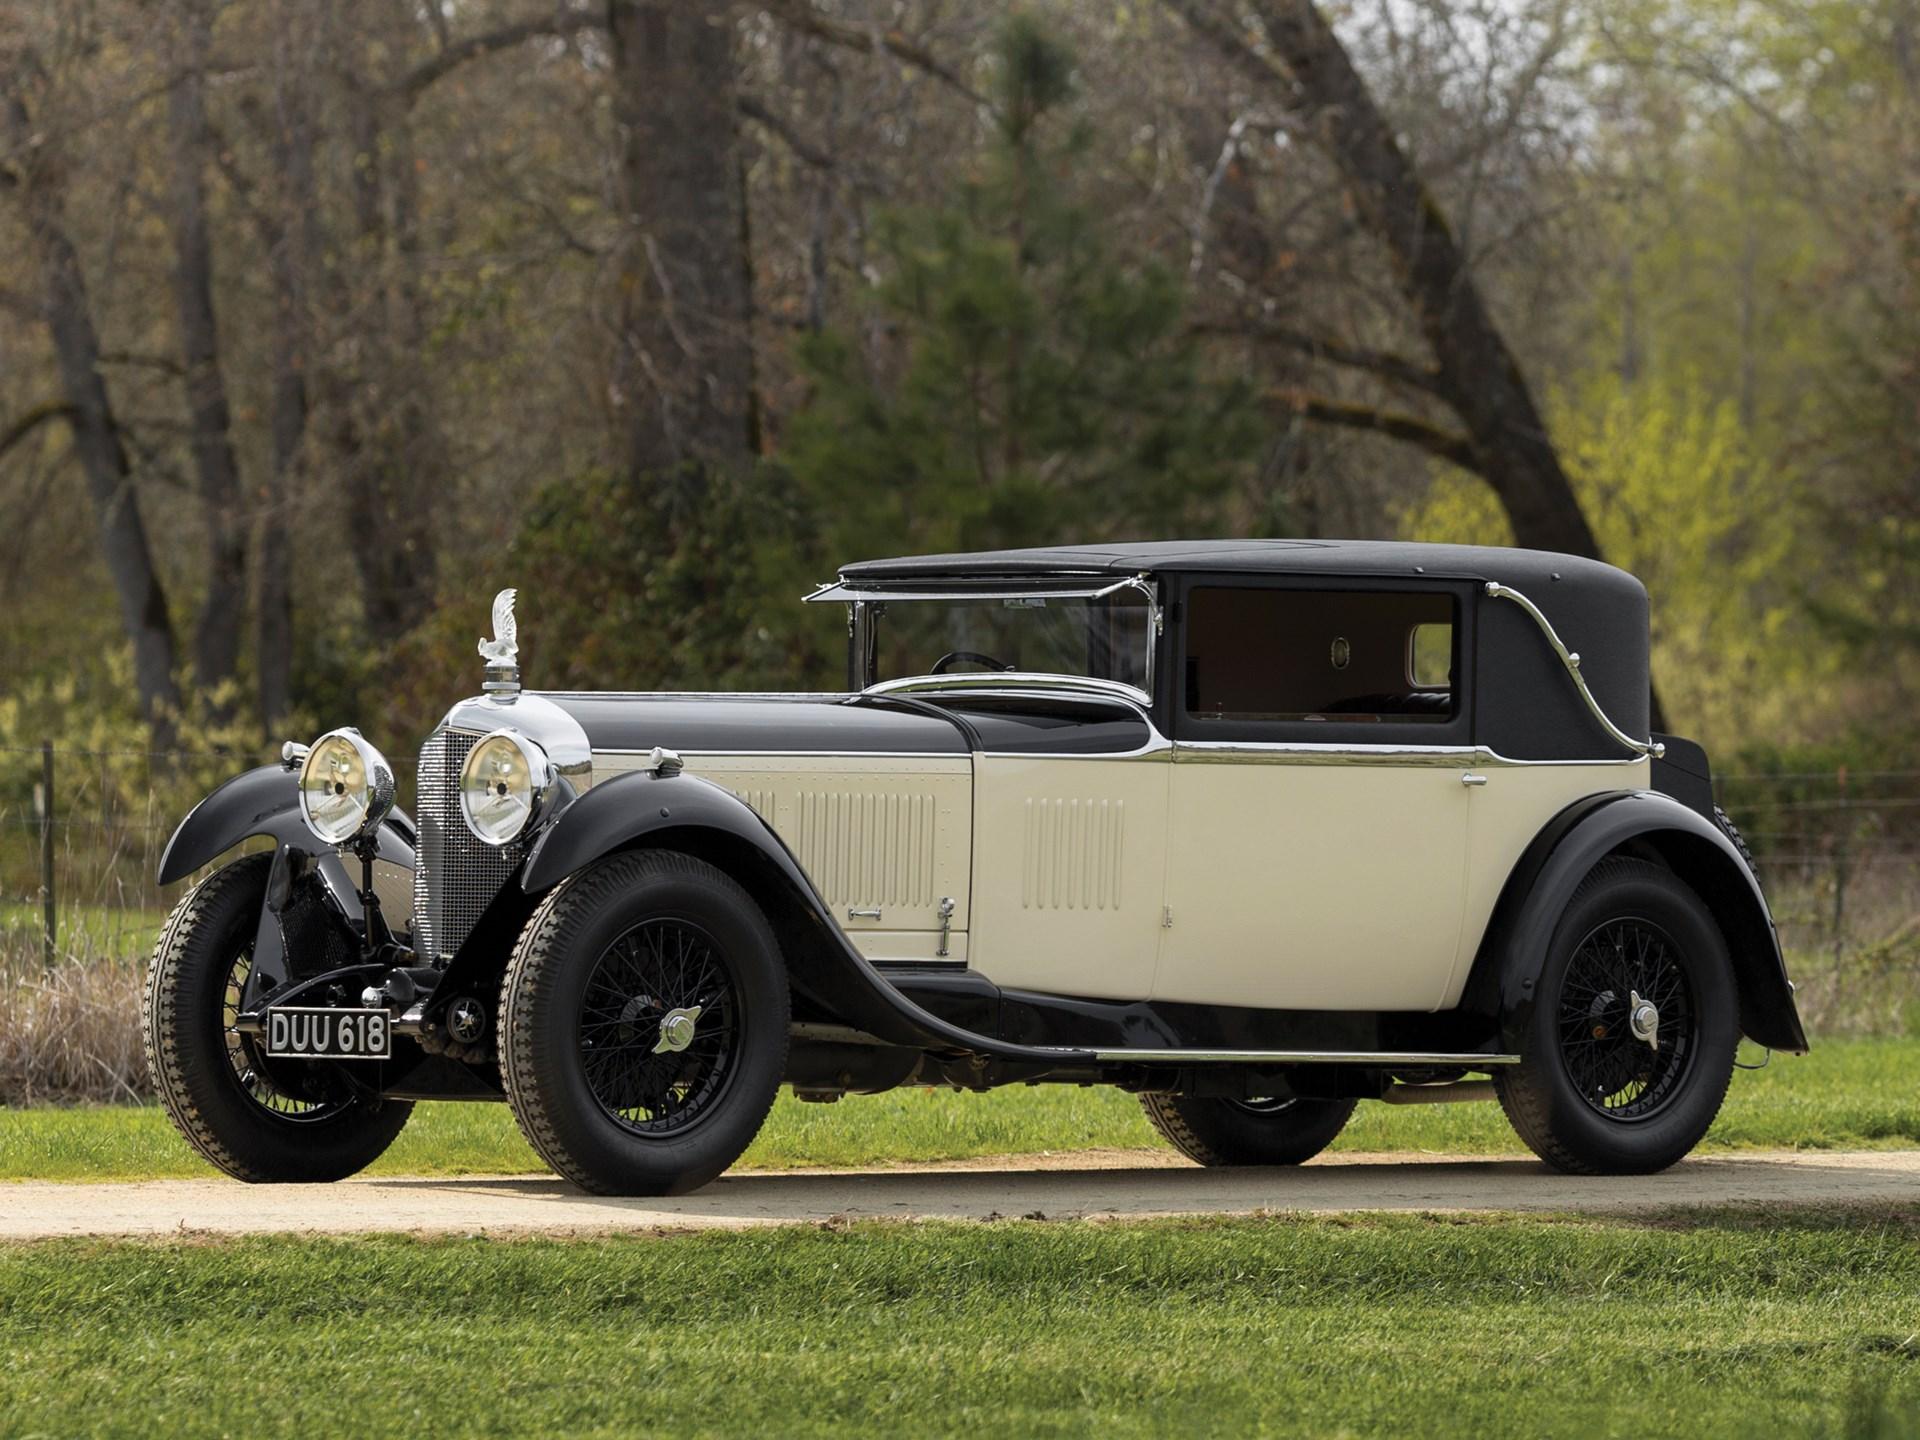 Image result for rm 1930 Bentley Speed Six HJ Mulliner